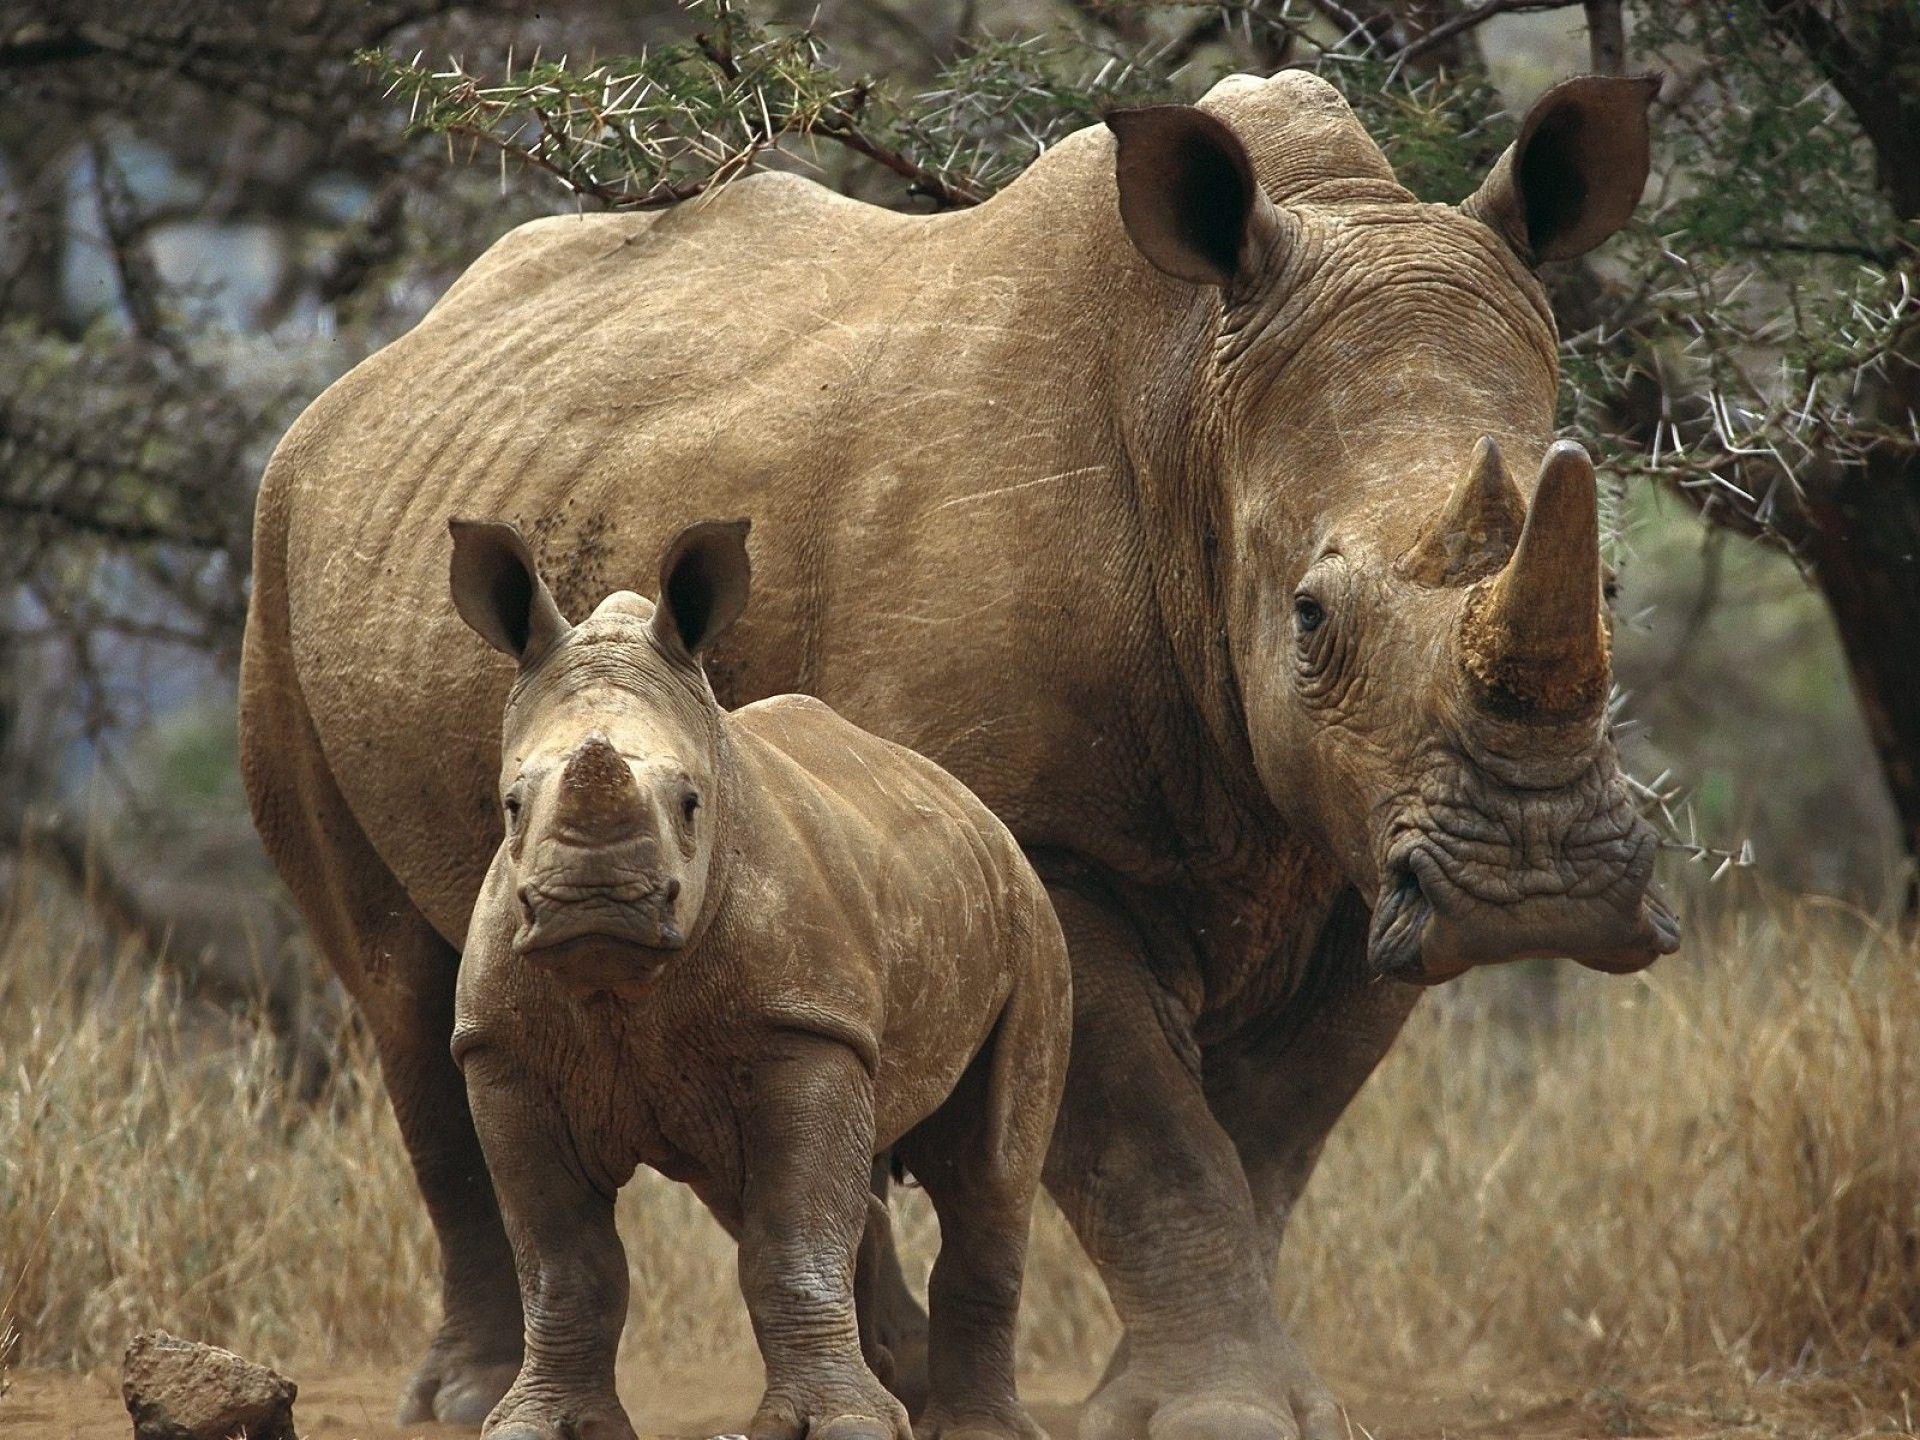 animal rhino wallpaper rinoceronte pinterest rhinos